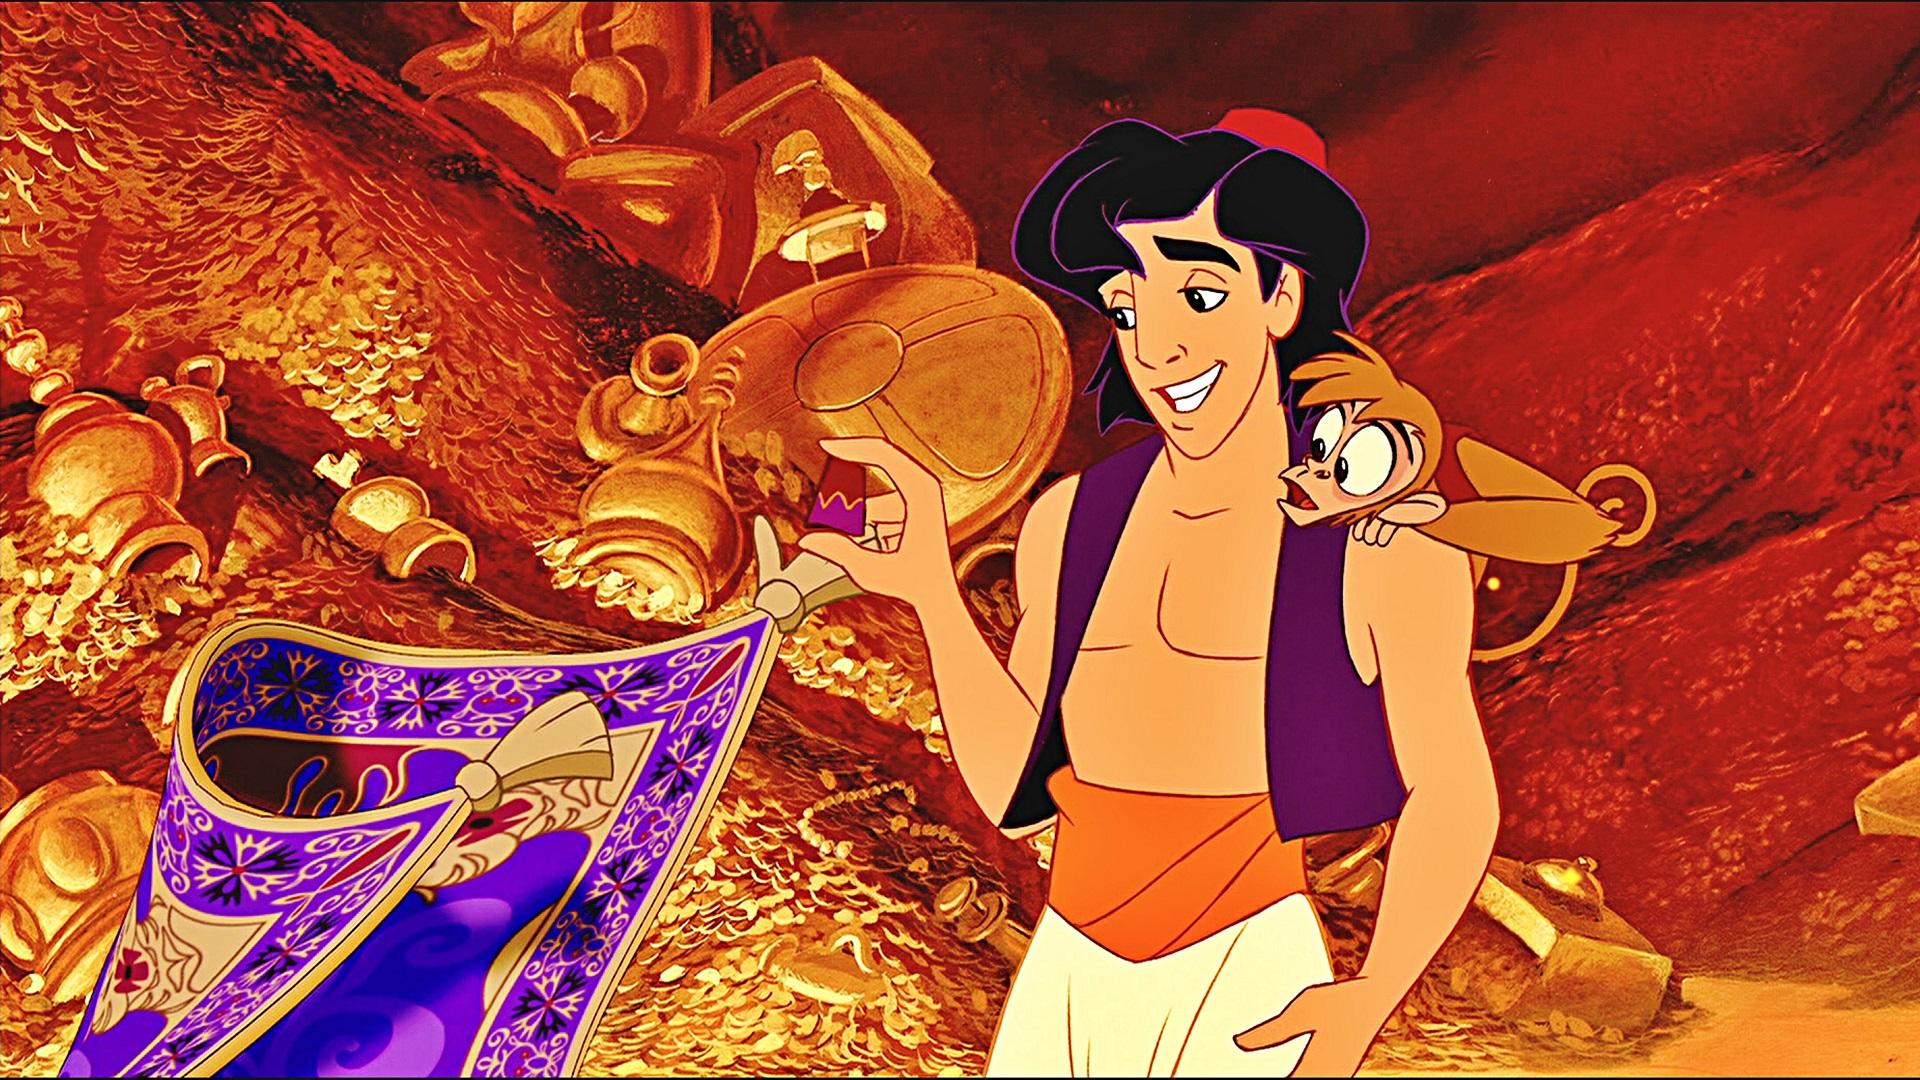 Disney trabaja en IA capaz de juzgar la calidad de una historia